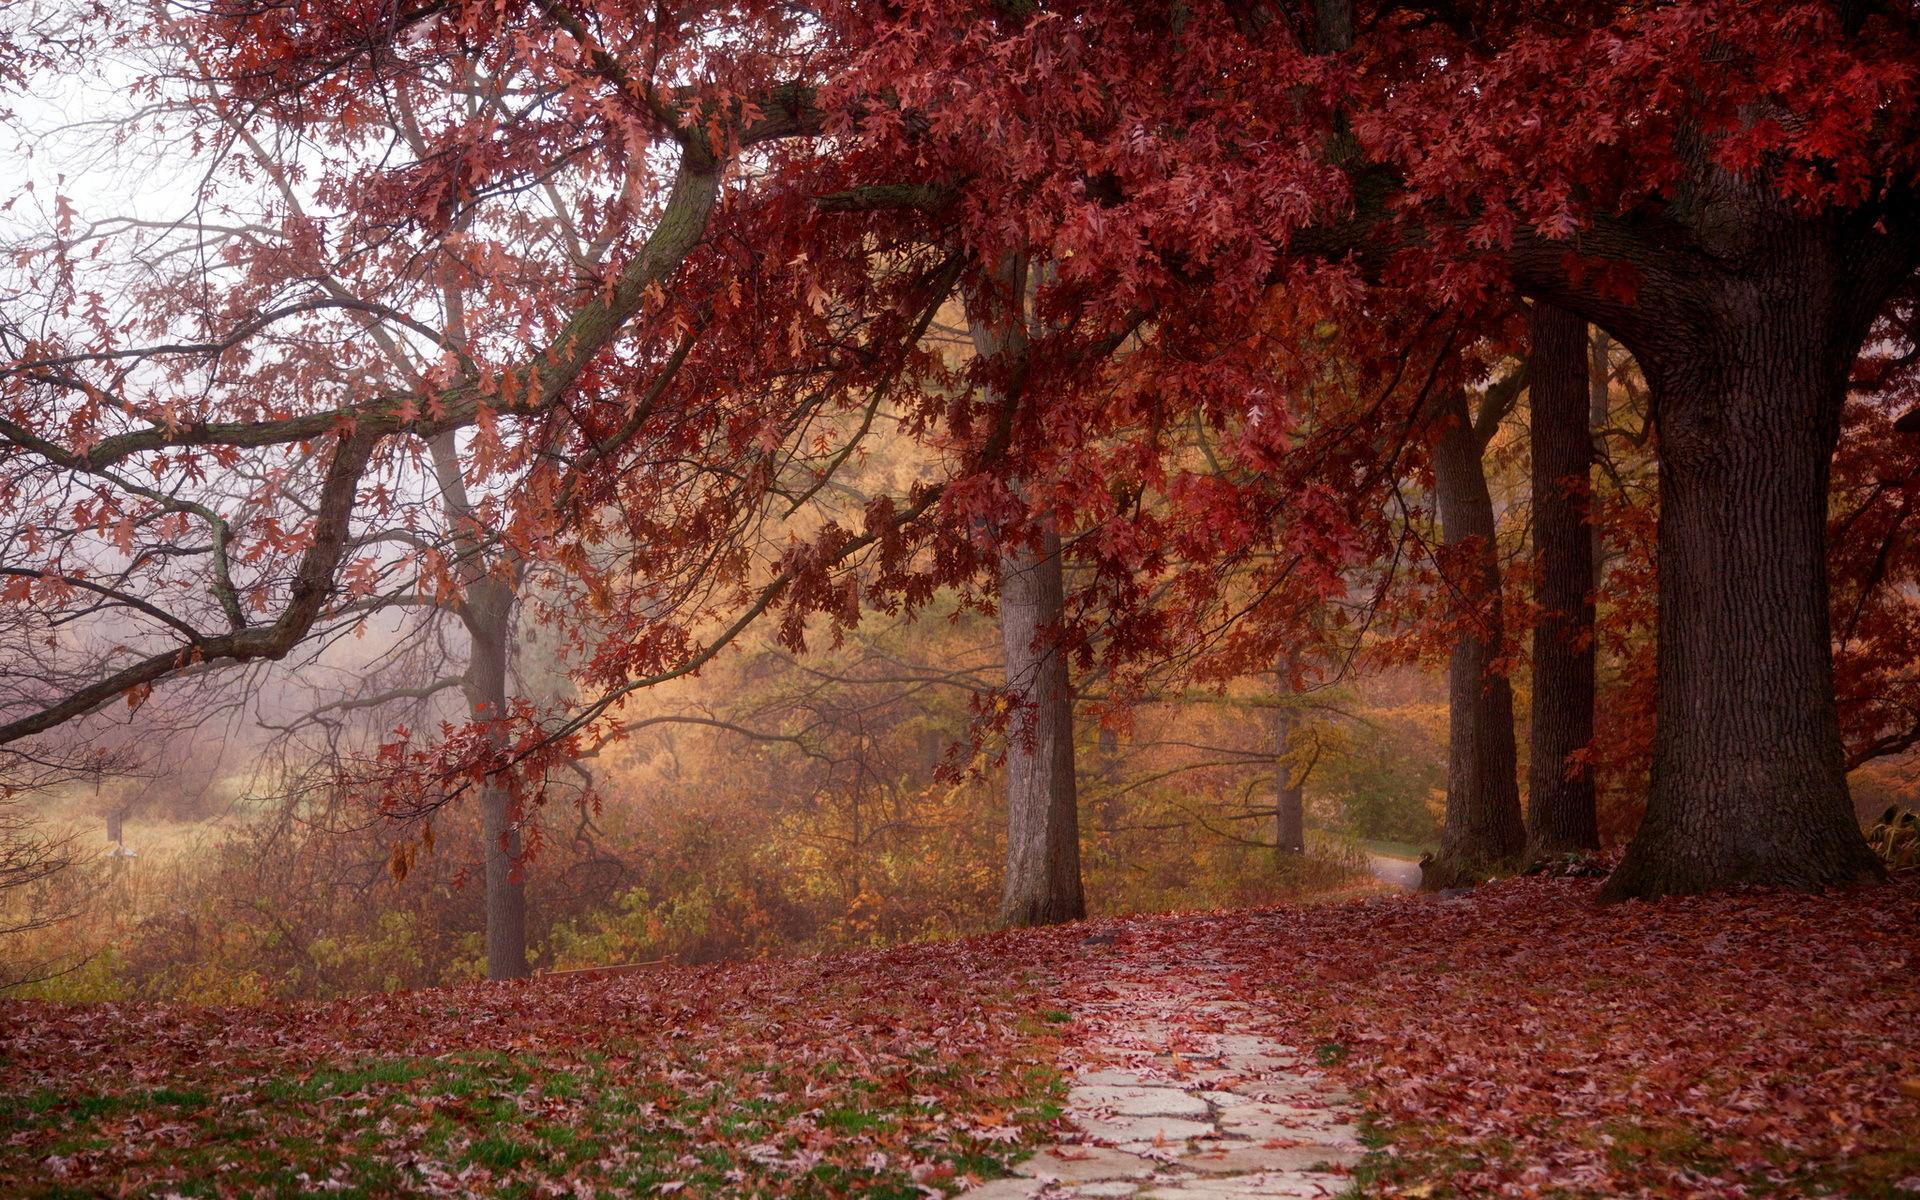 Autumn Leaves 3d Live Wallpaper Redwood Forest Wallpaper Hd Hd Desktop Wallpapers 4k Hd